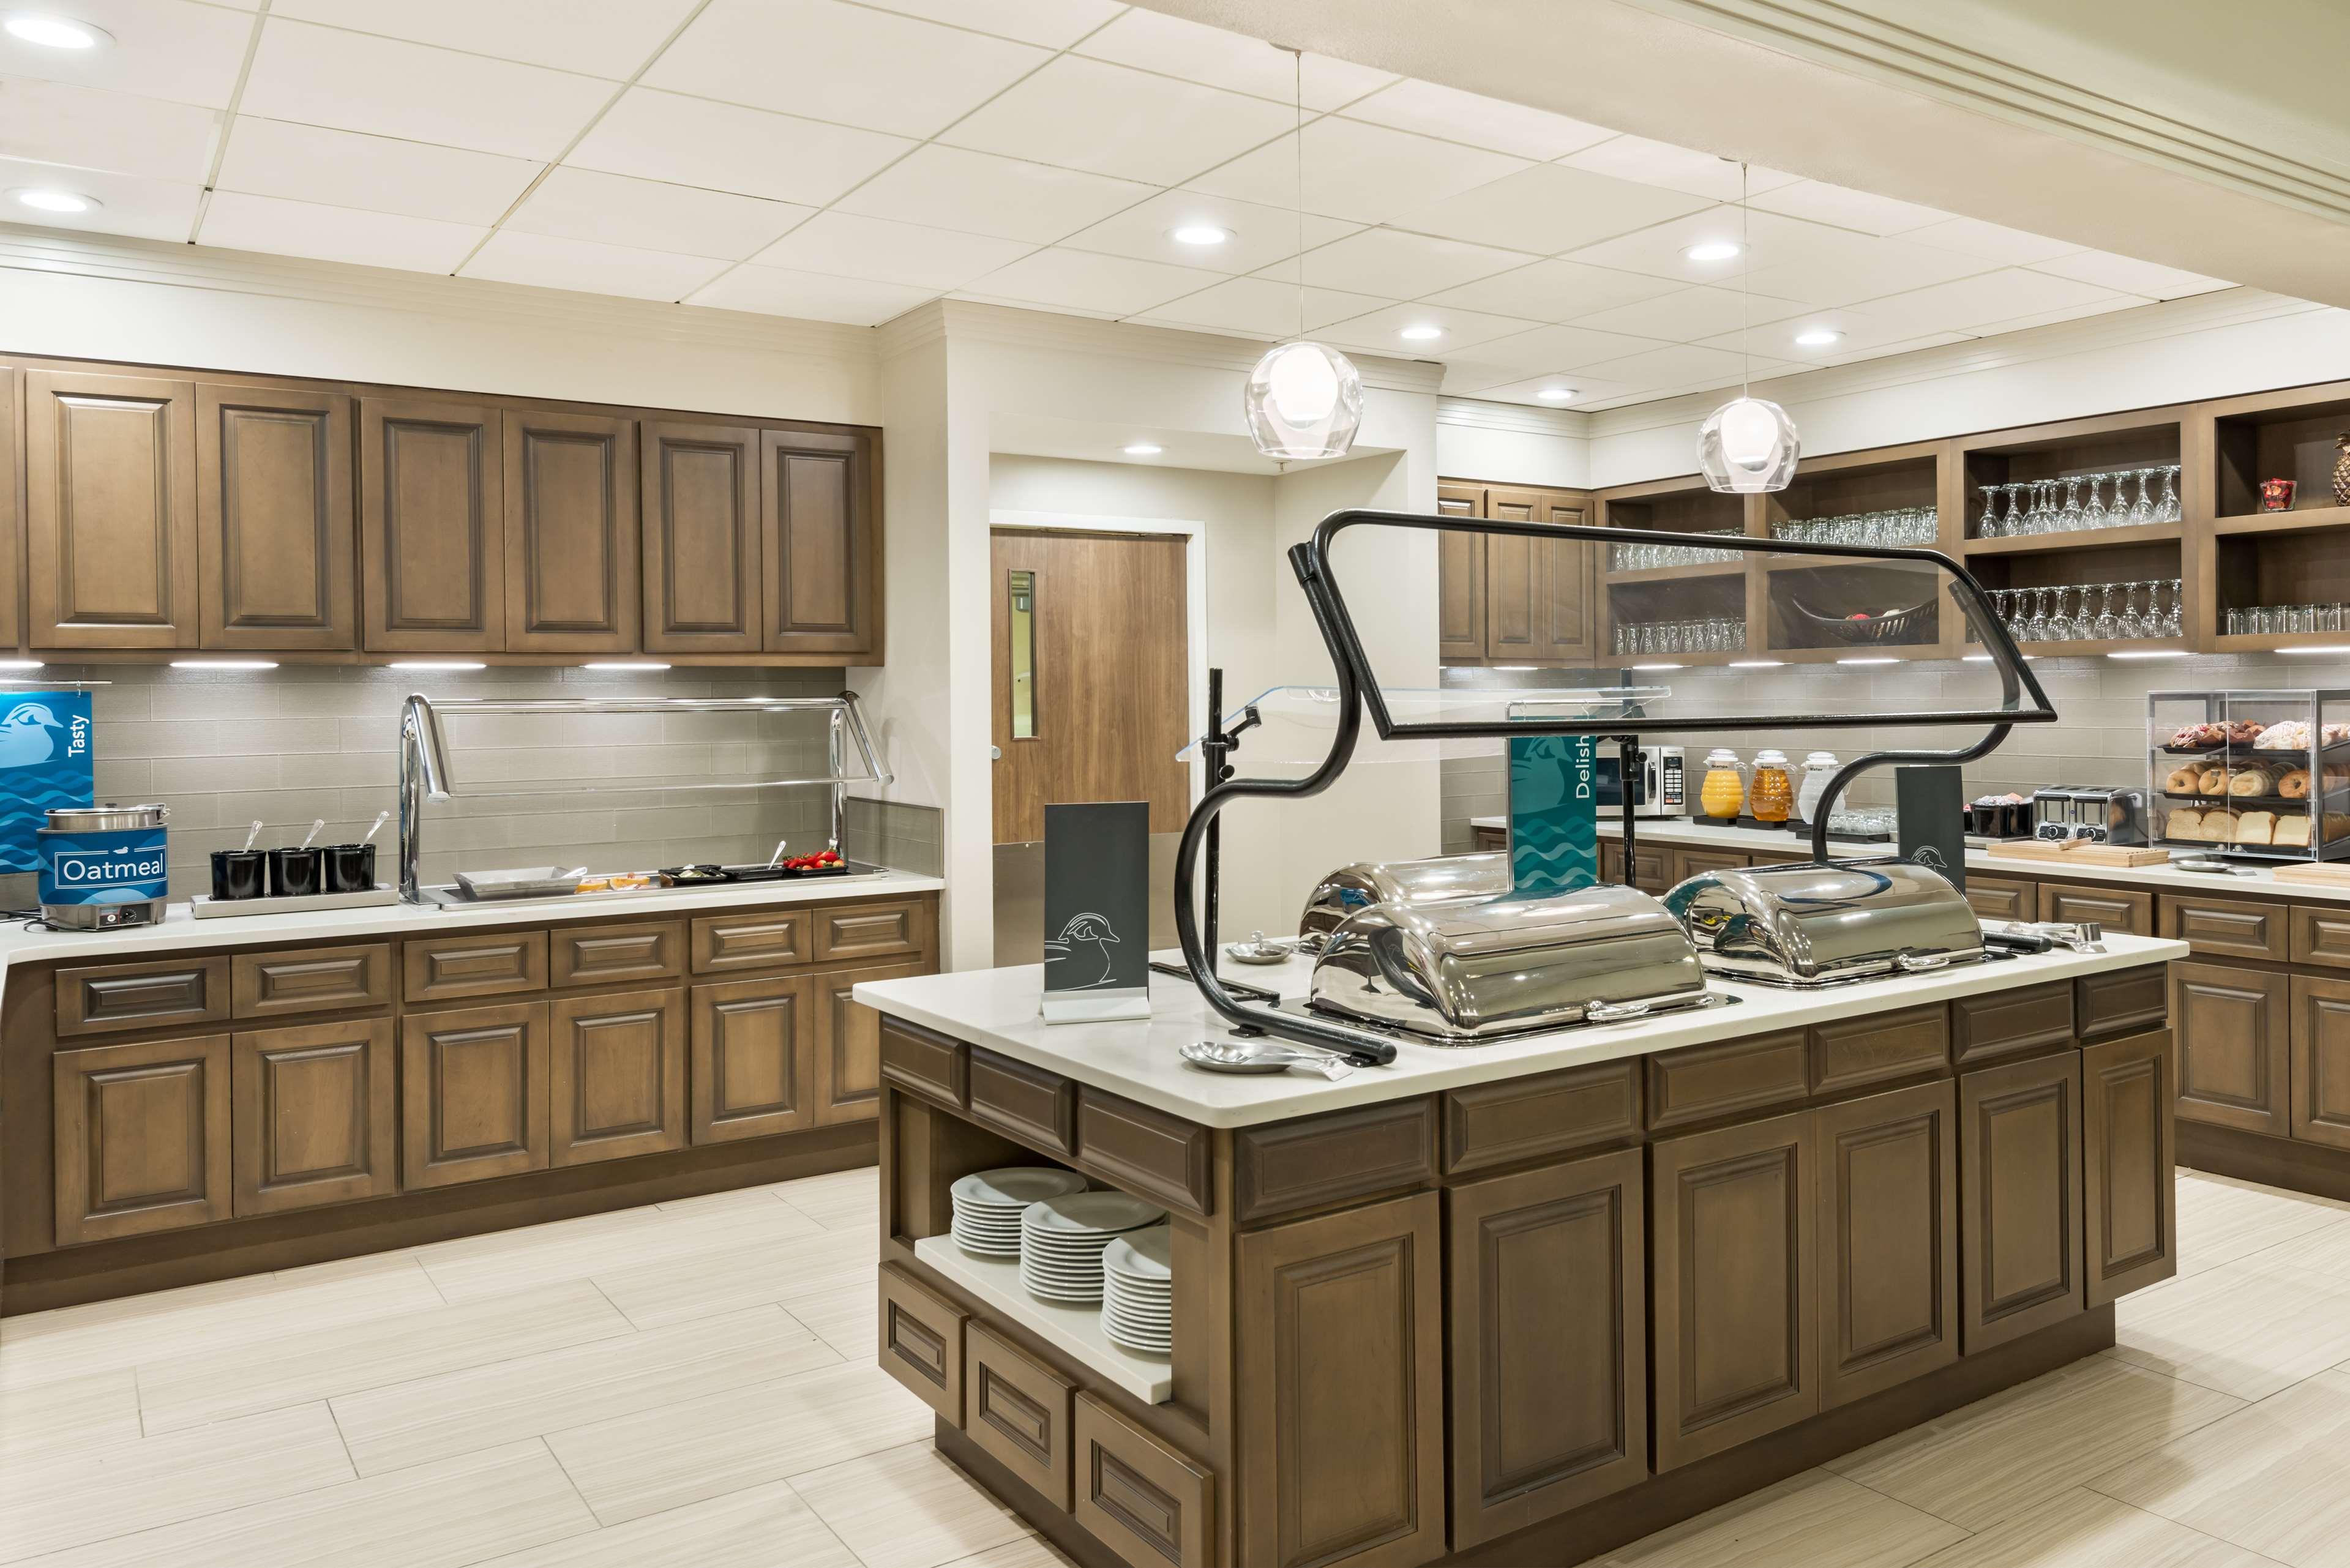 Homewood Suites by Hilton Orlando-UCF Area image 11